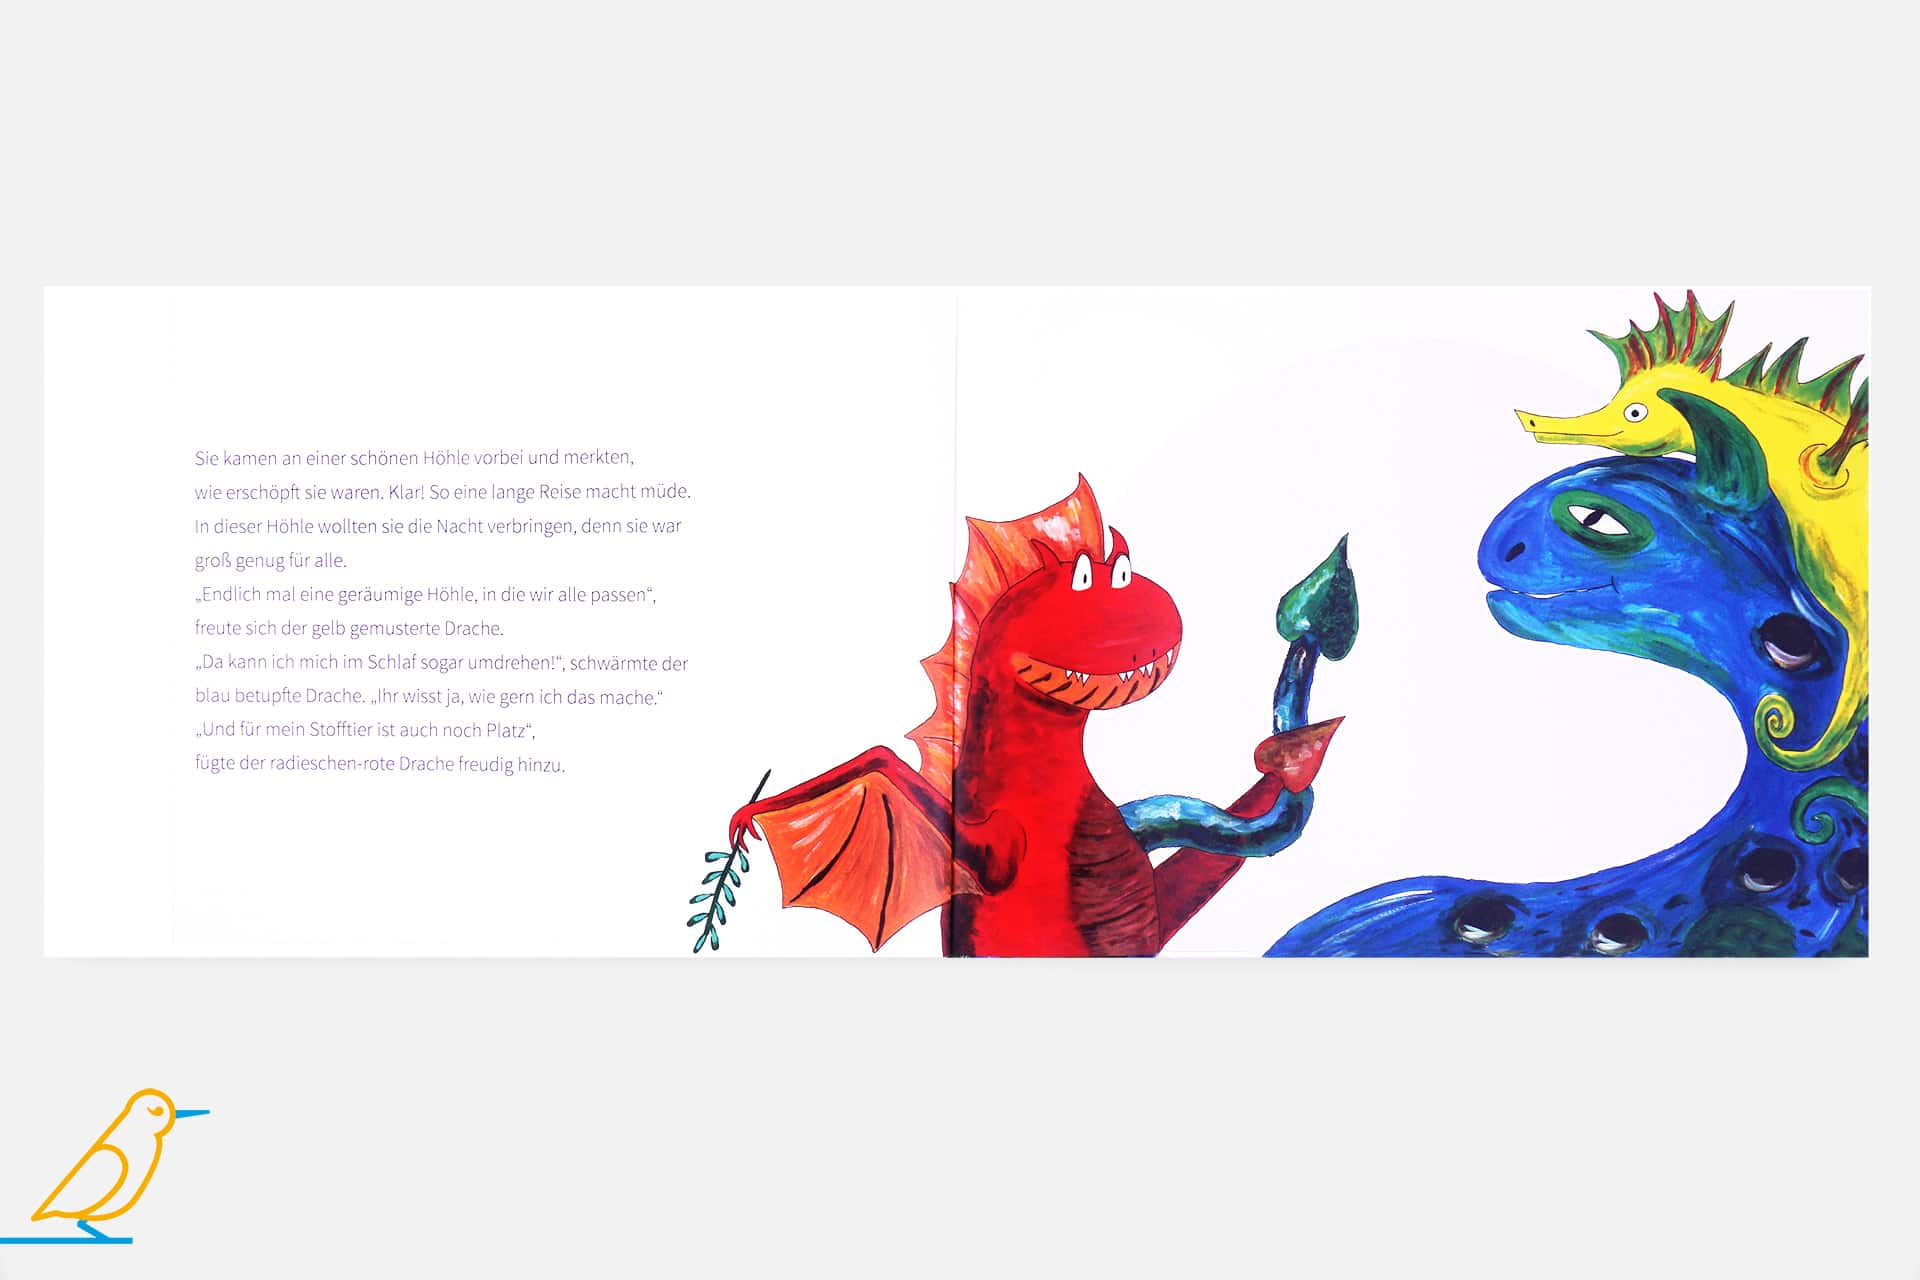 Blick ins Buch »Drei kunterbunte Drachen«